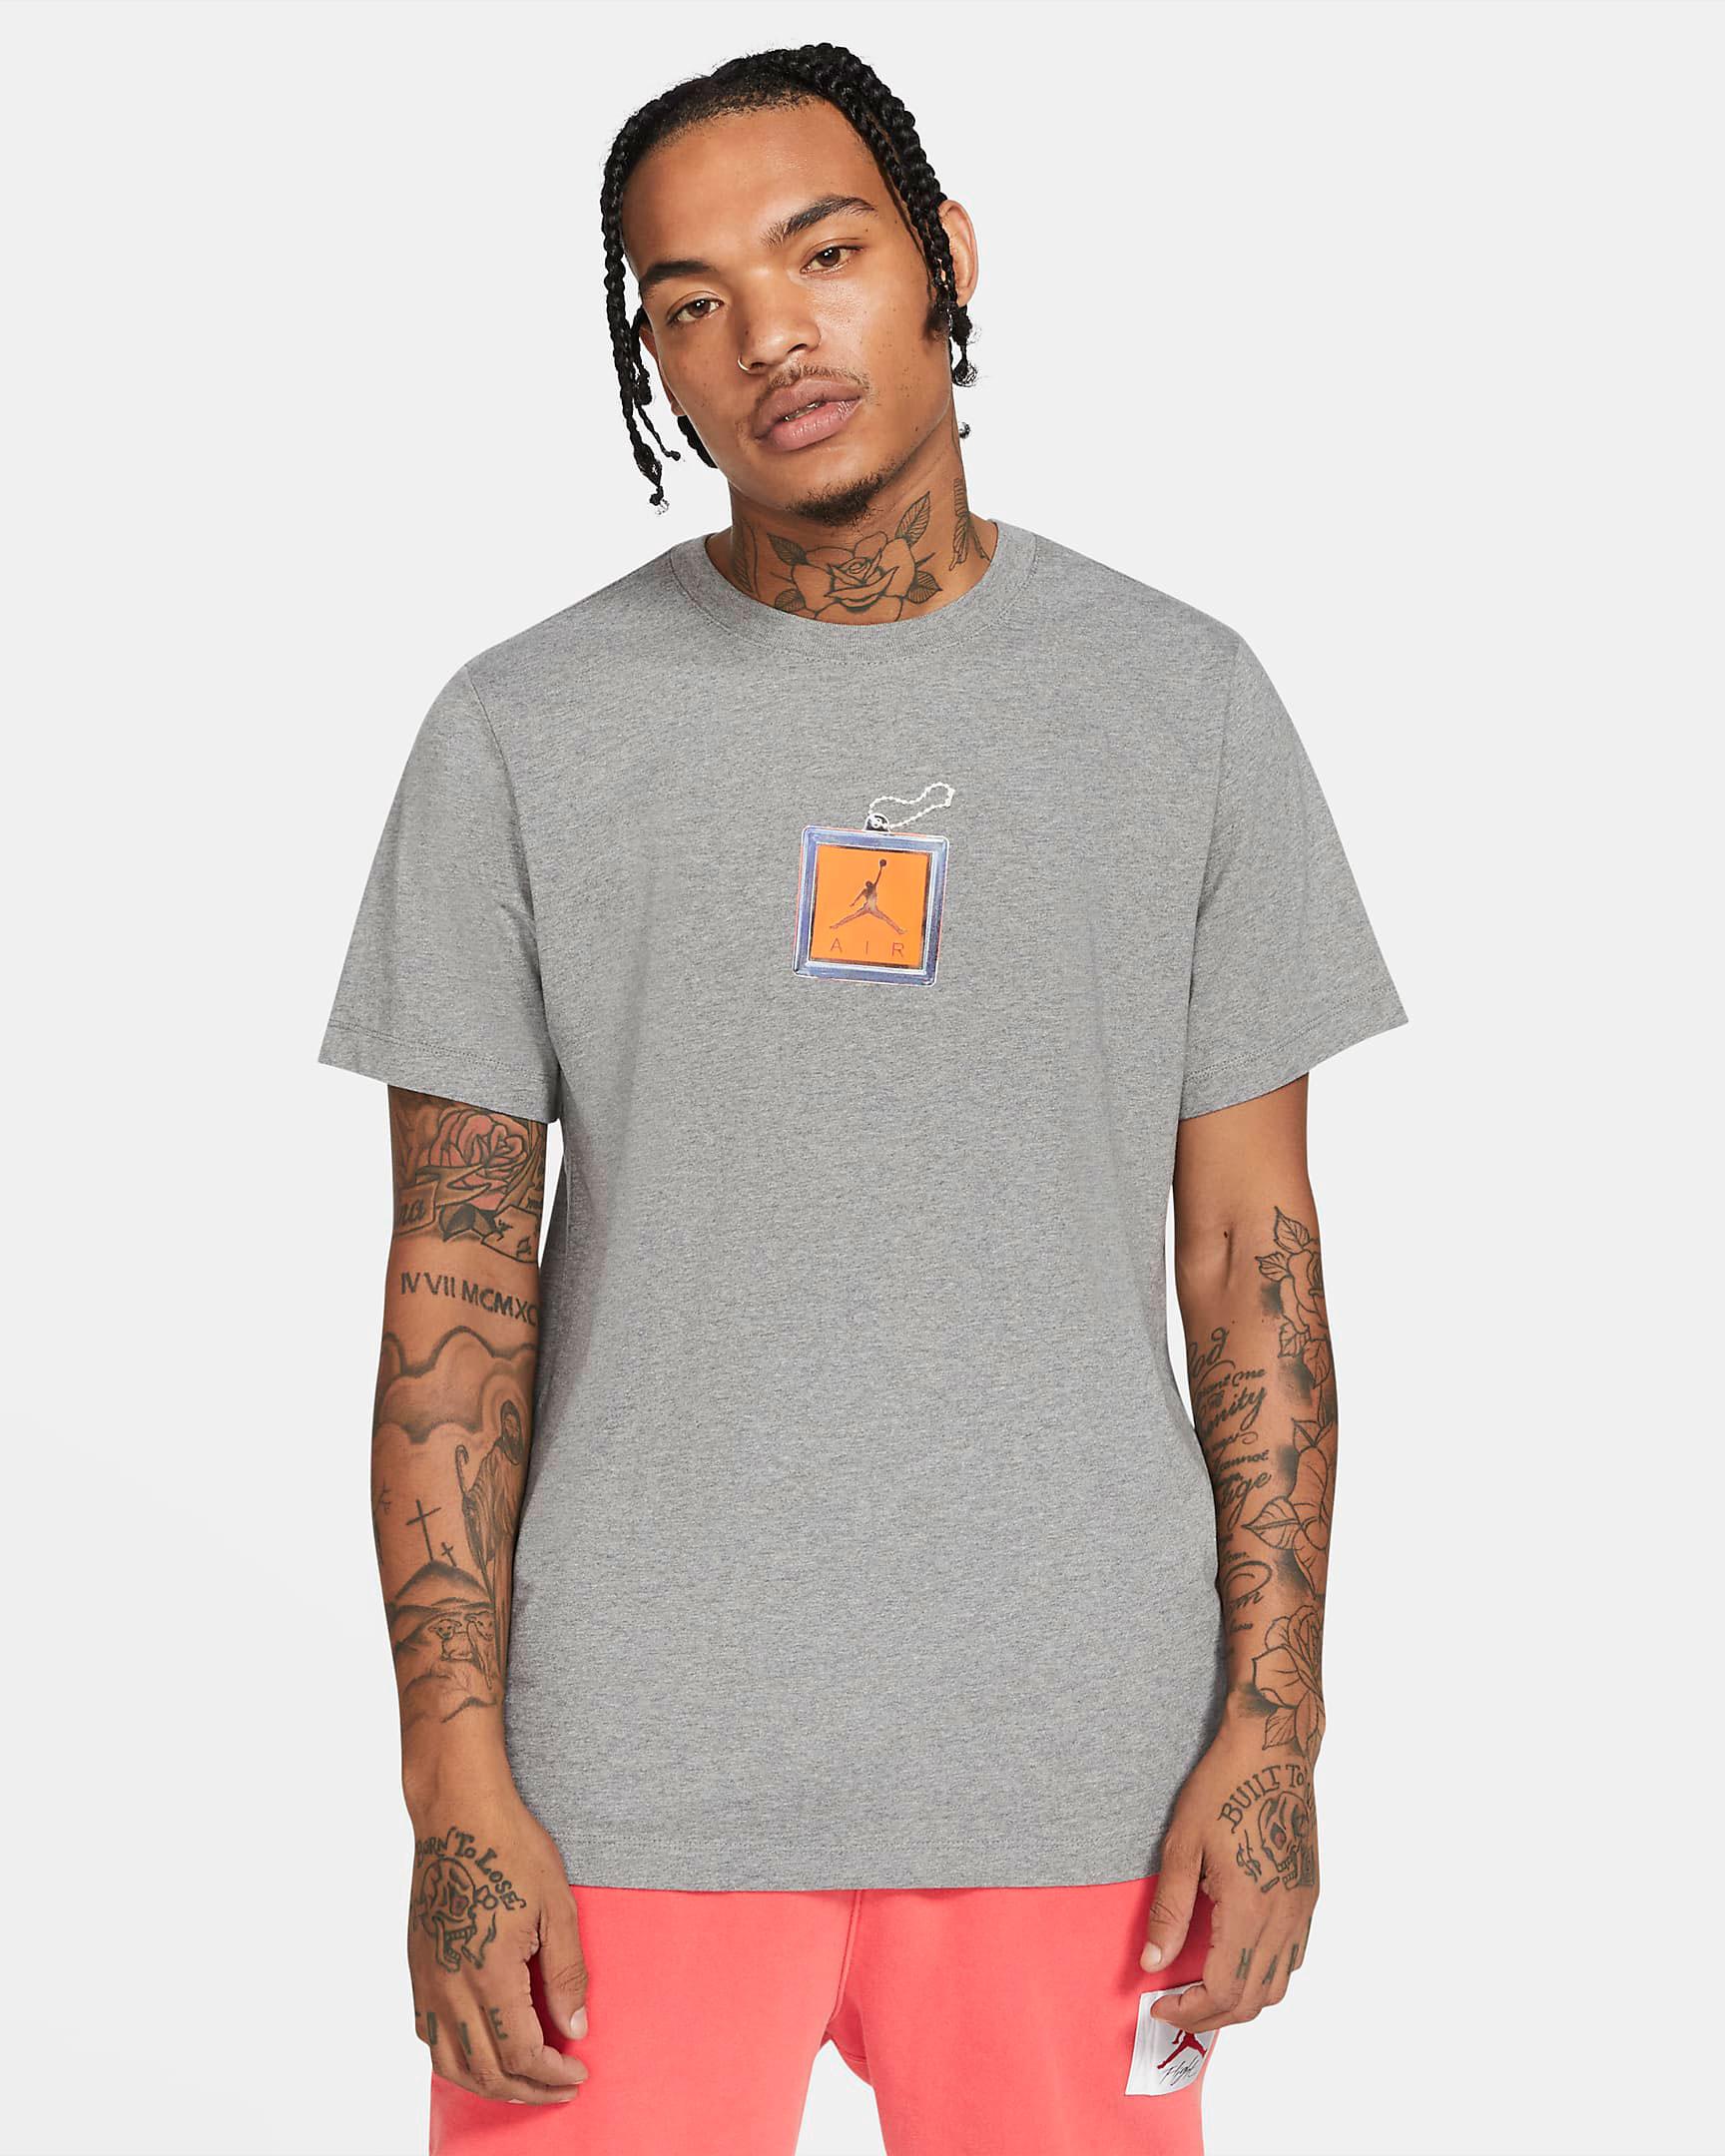 jordan-keychain-shirt-grey-orange-1